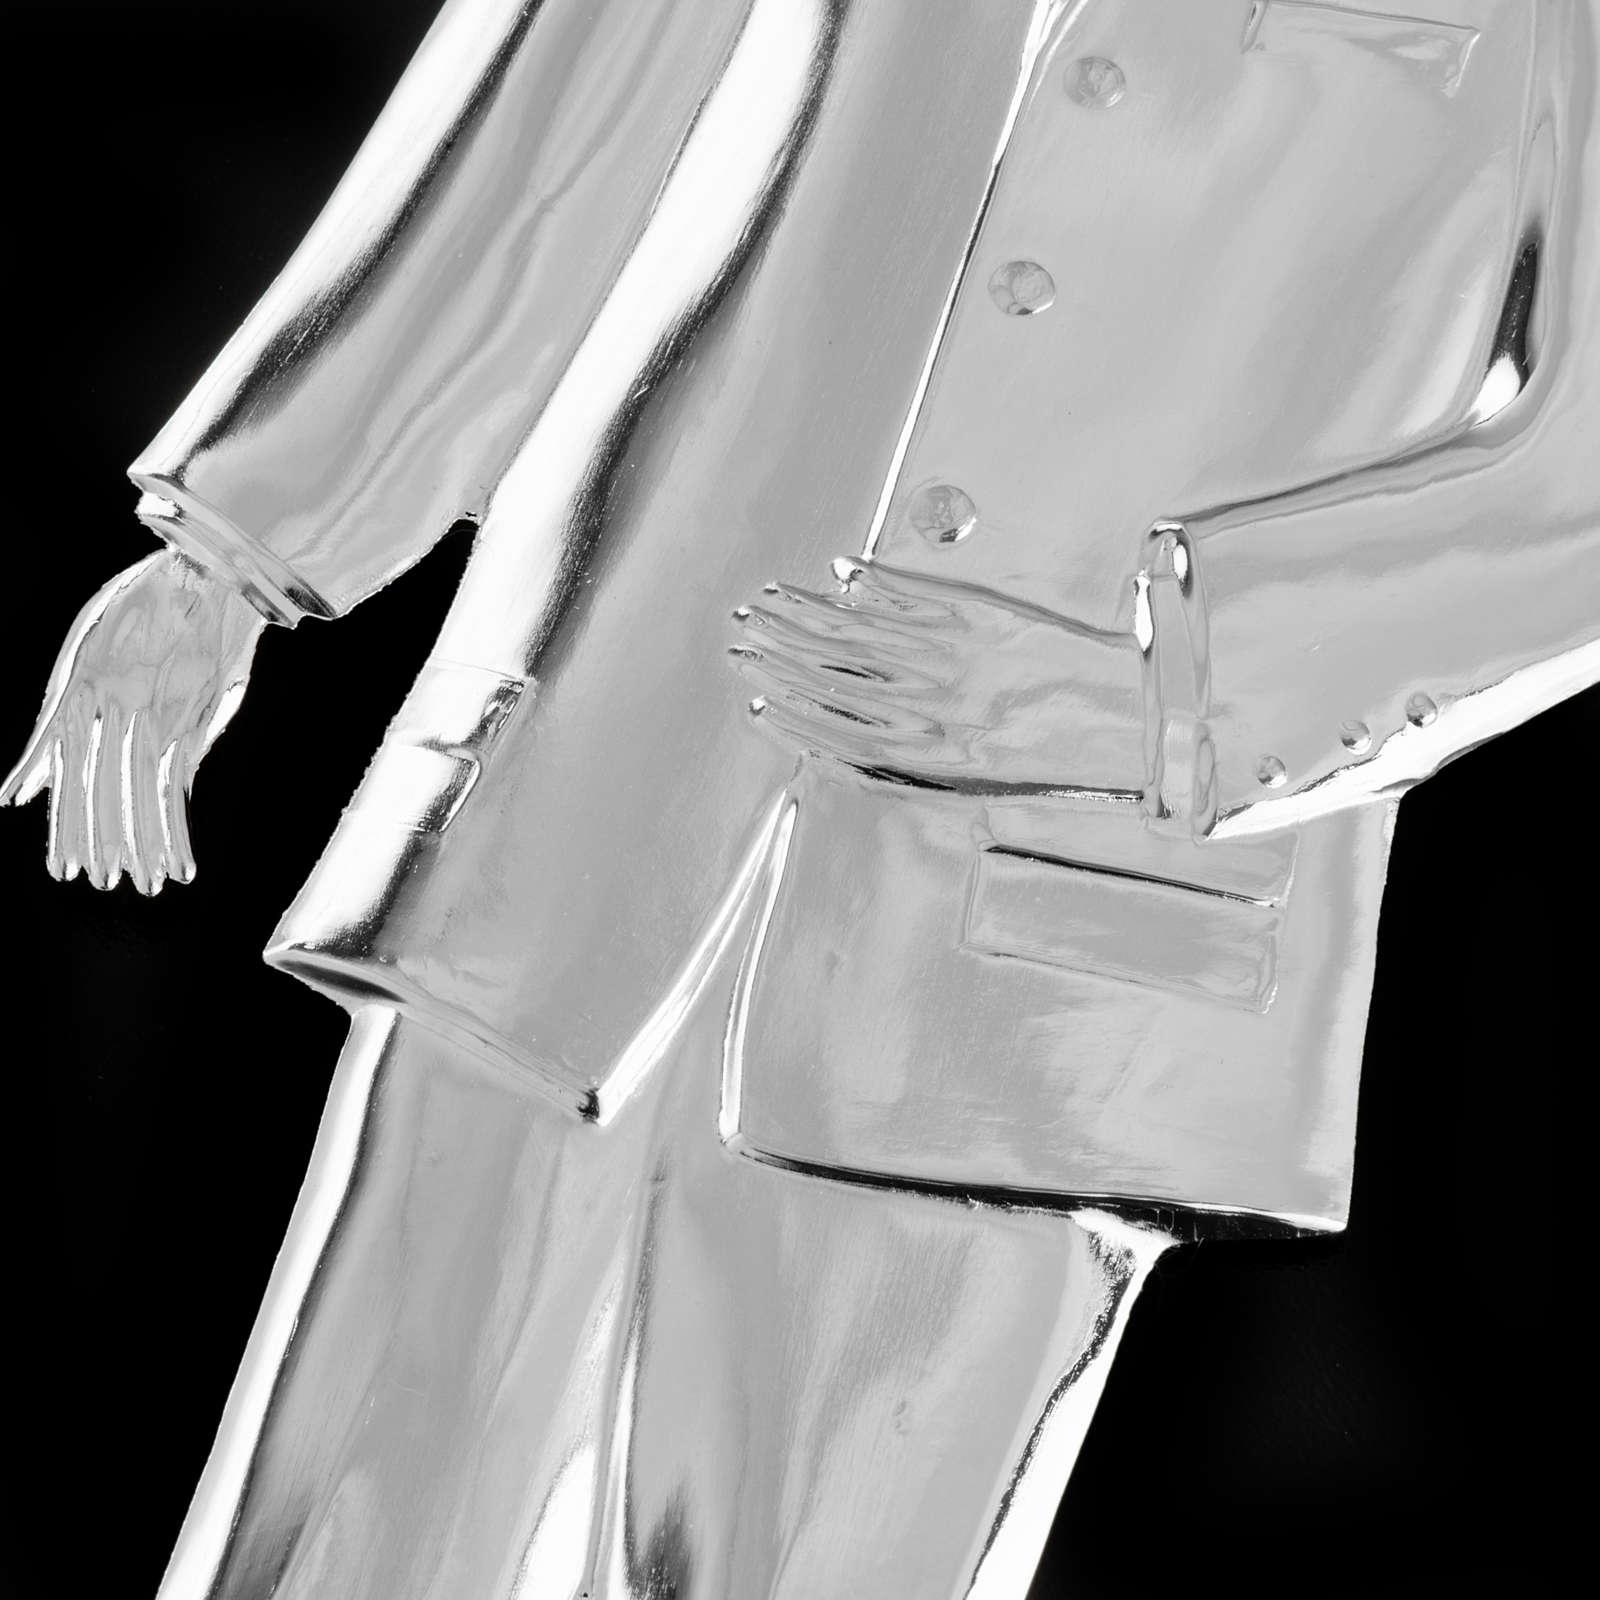 Ex-voto, man in sterling silver or metal, 21cm 3